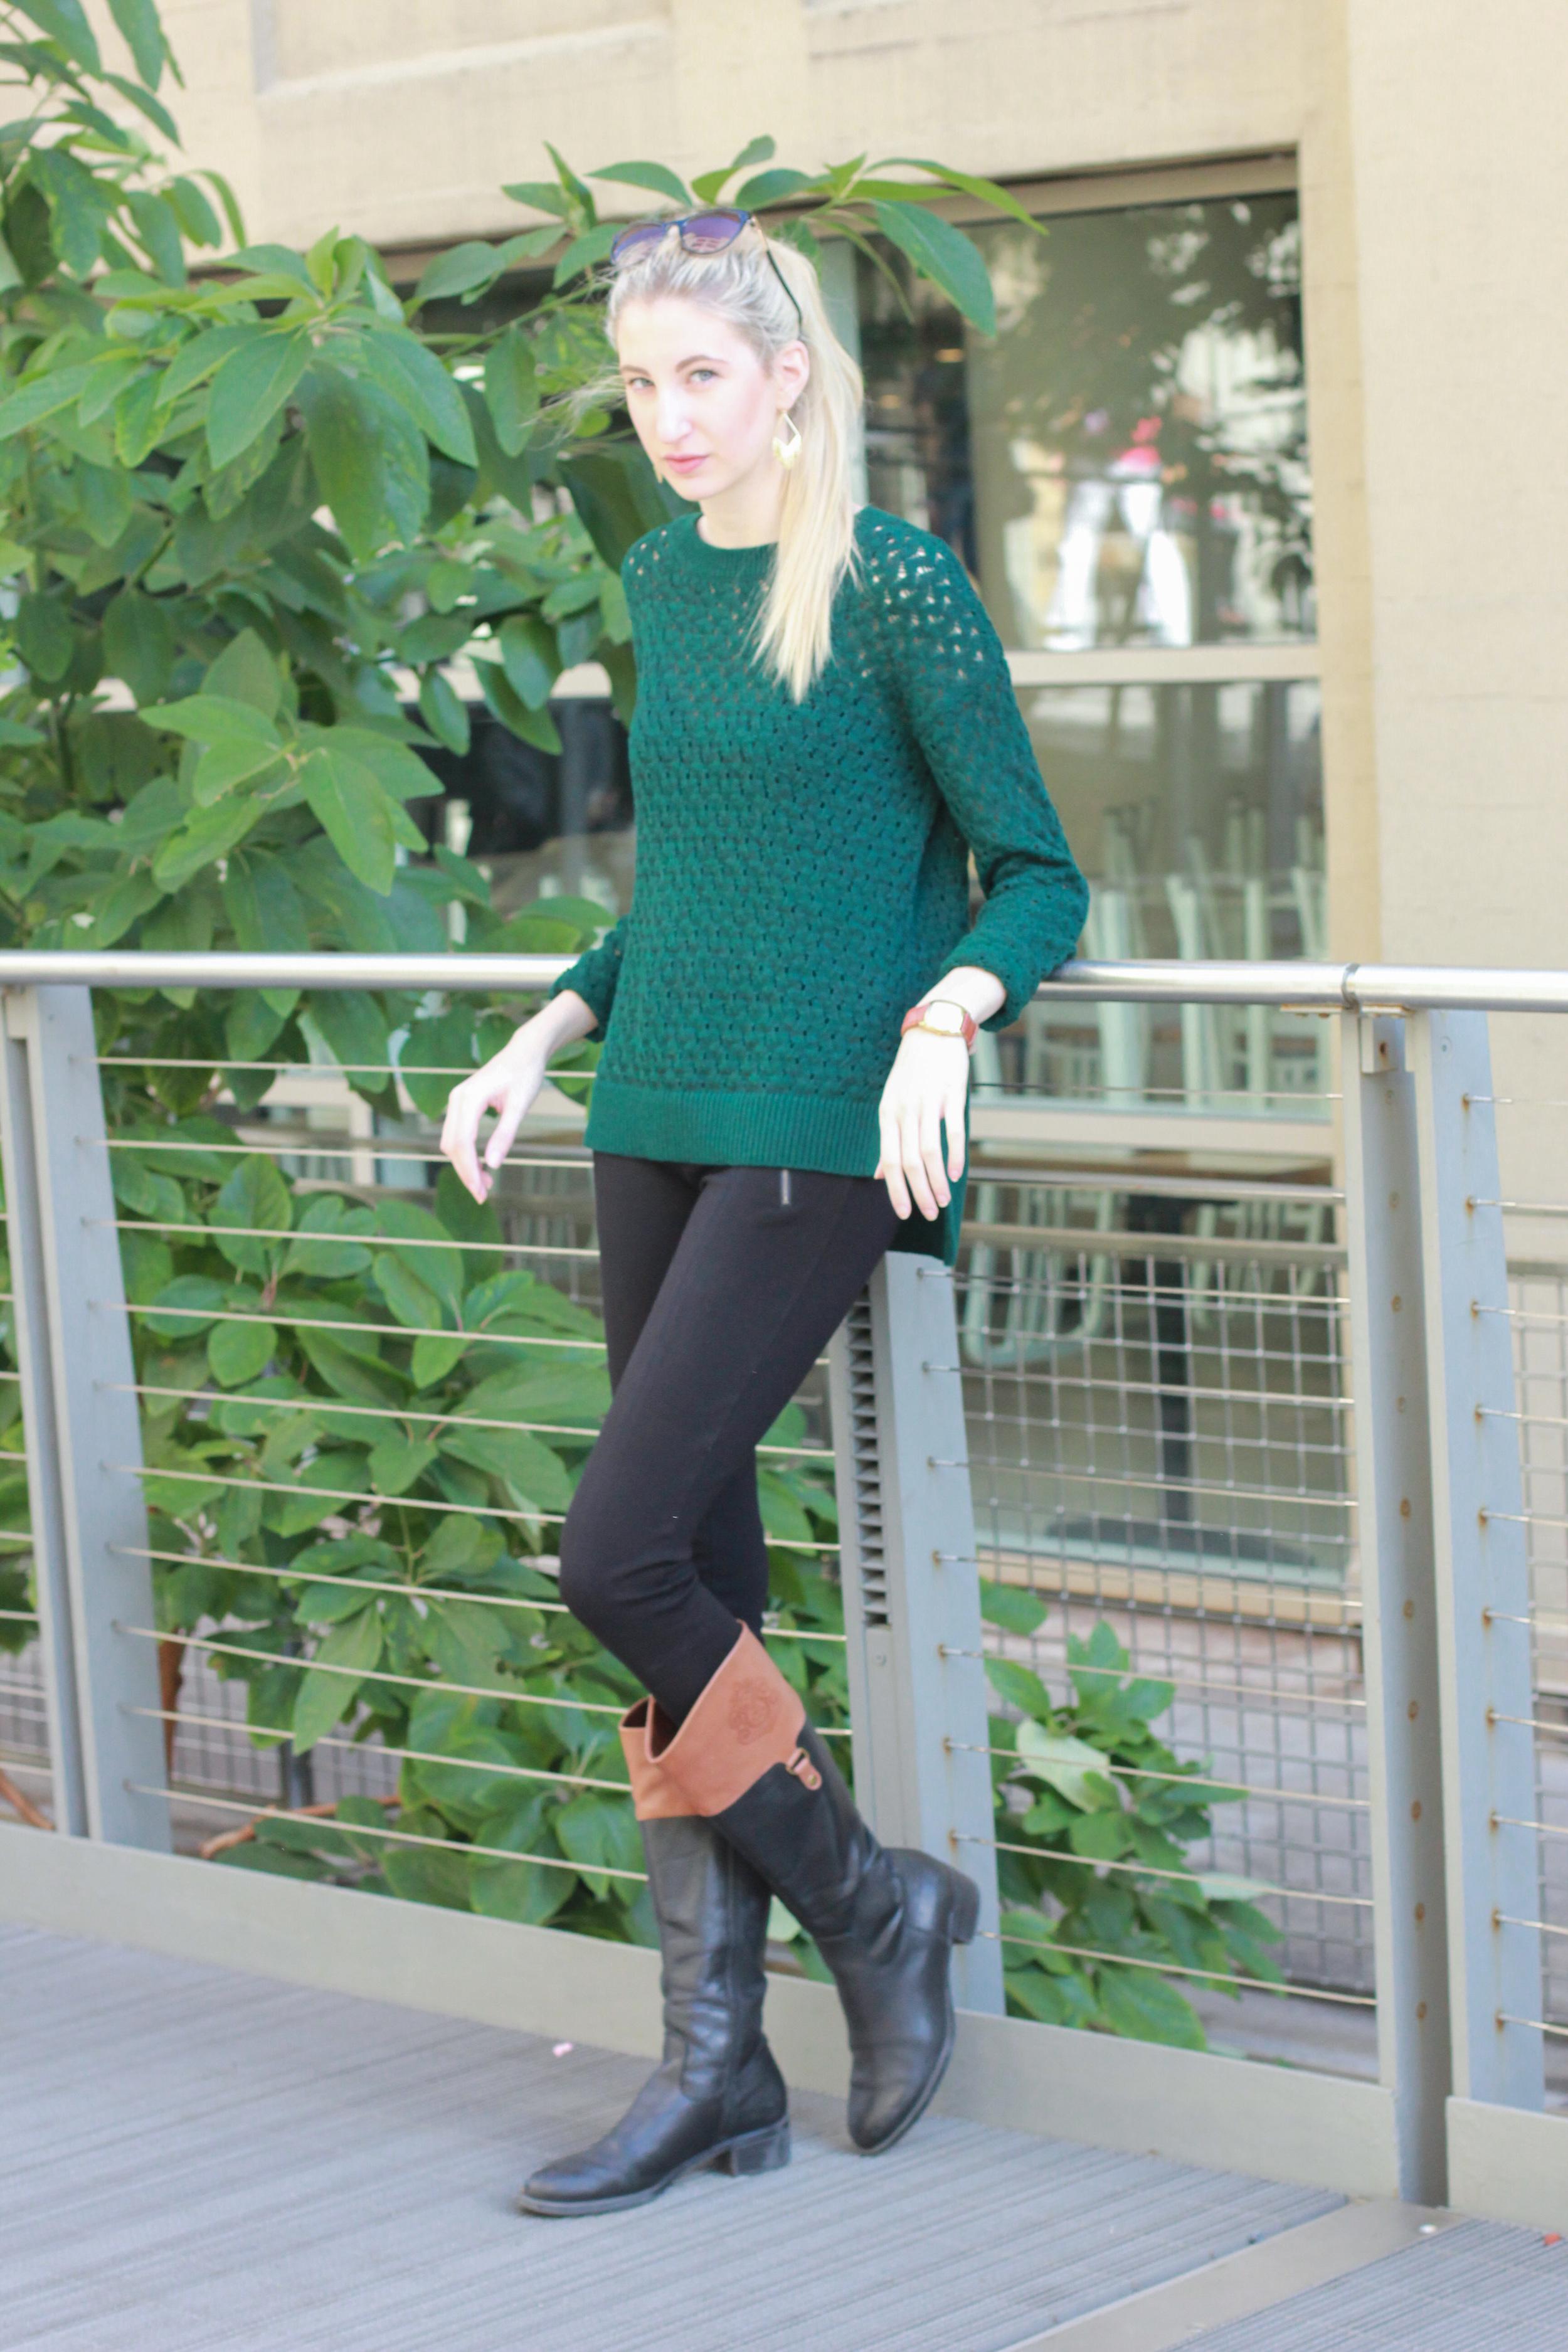 LOFT green sweater, J.Crew pixie pants, vintage citizen watch, franco sarto riding boots, LOFT cat eye sunglasses, LOFT fringe earrings